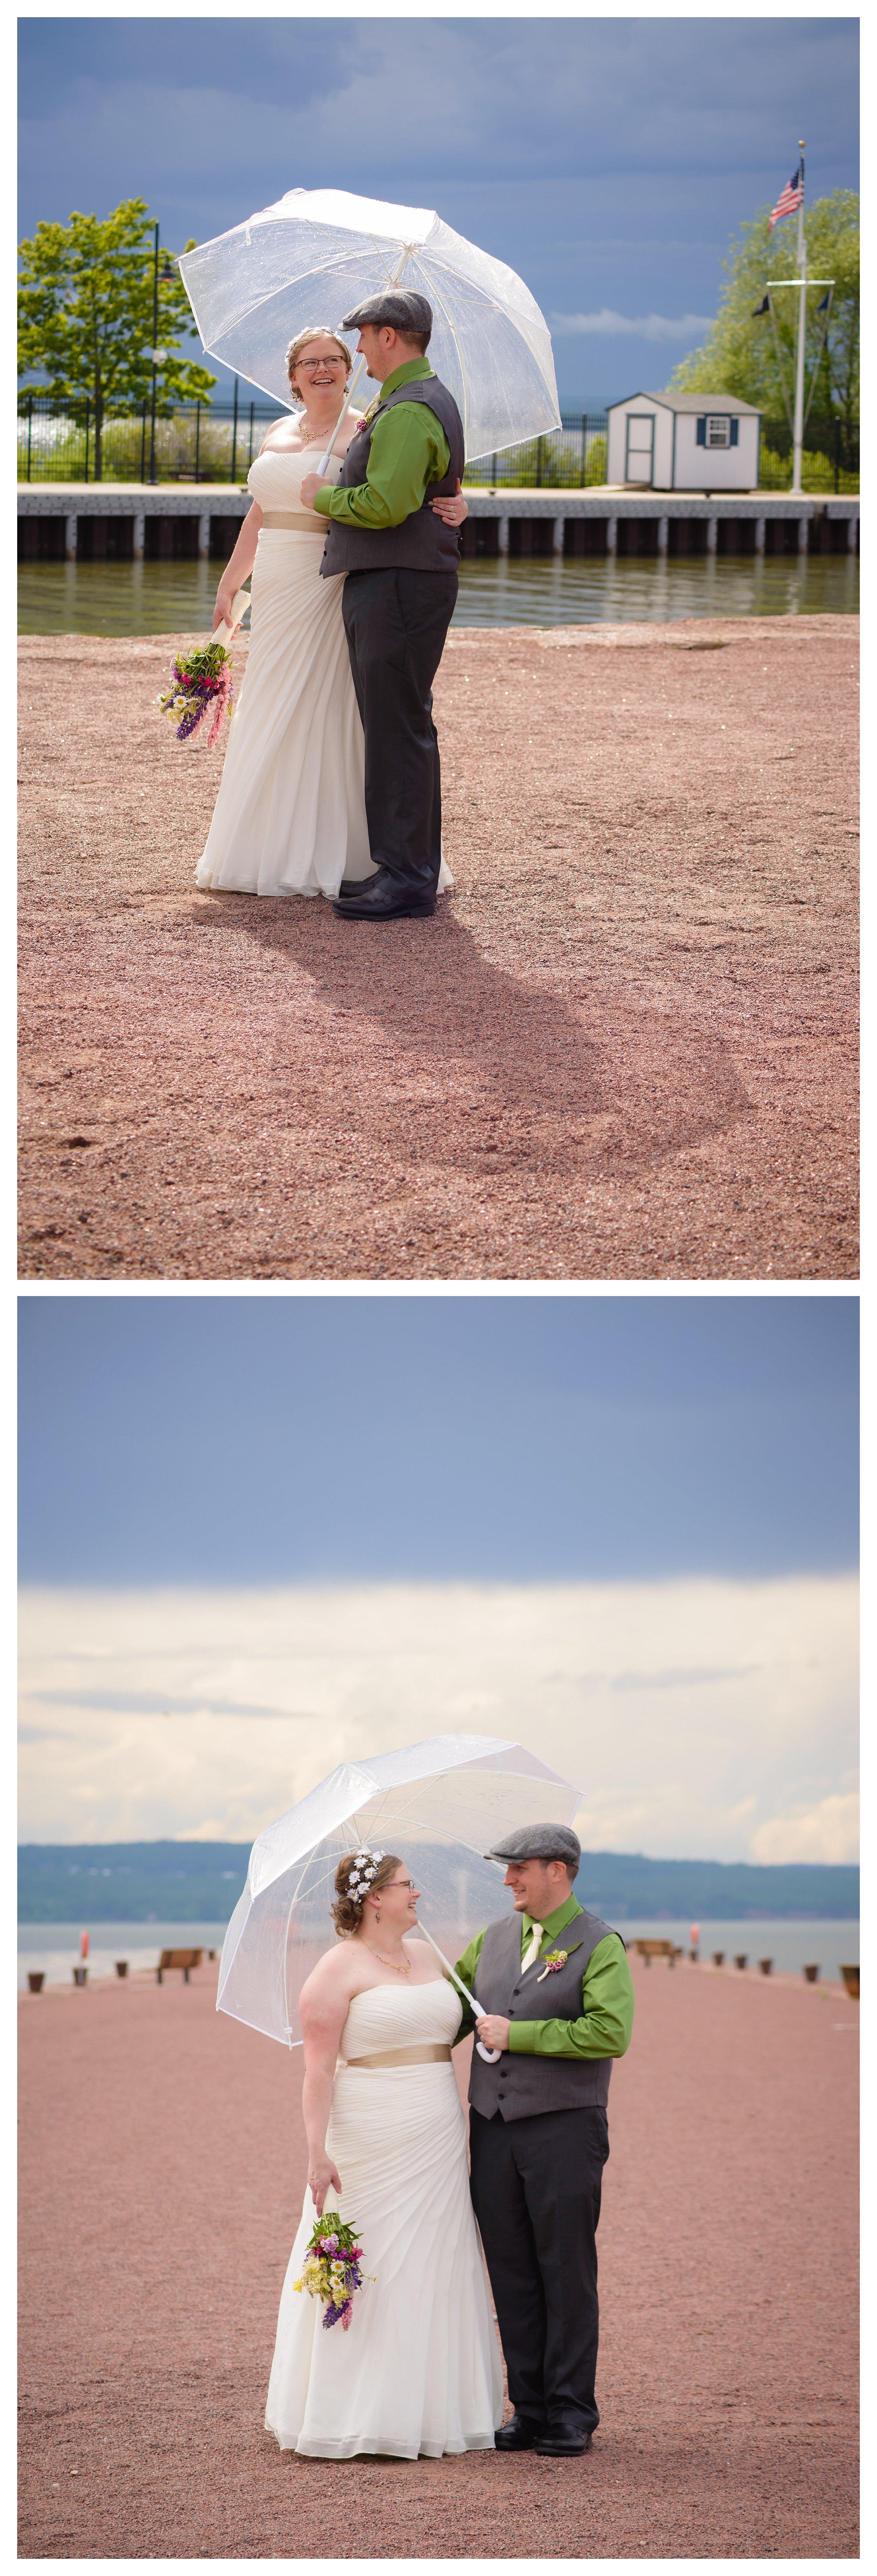 ashland oredock northwoods wisconsin wedding ps 139 photography_0300.jpg